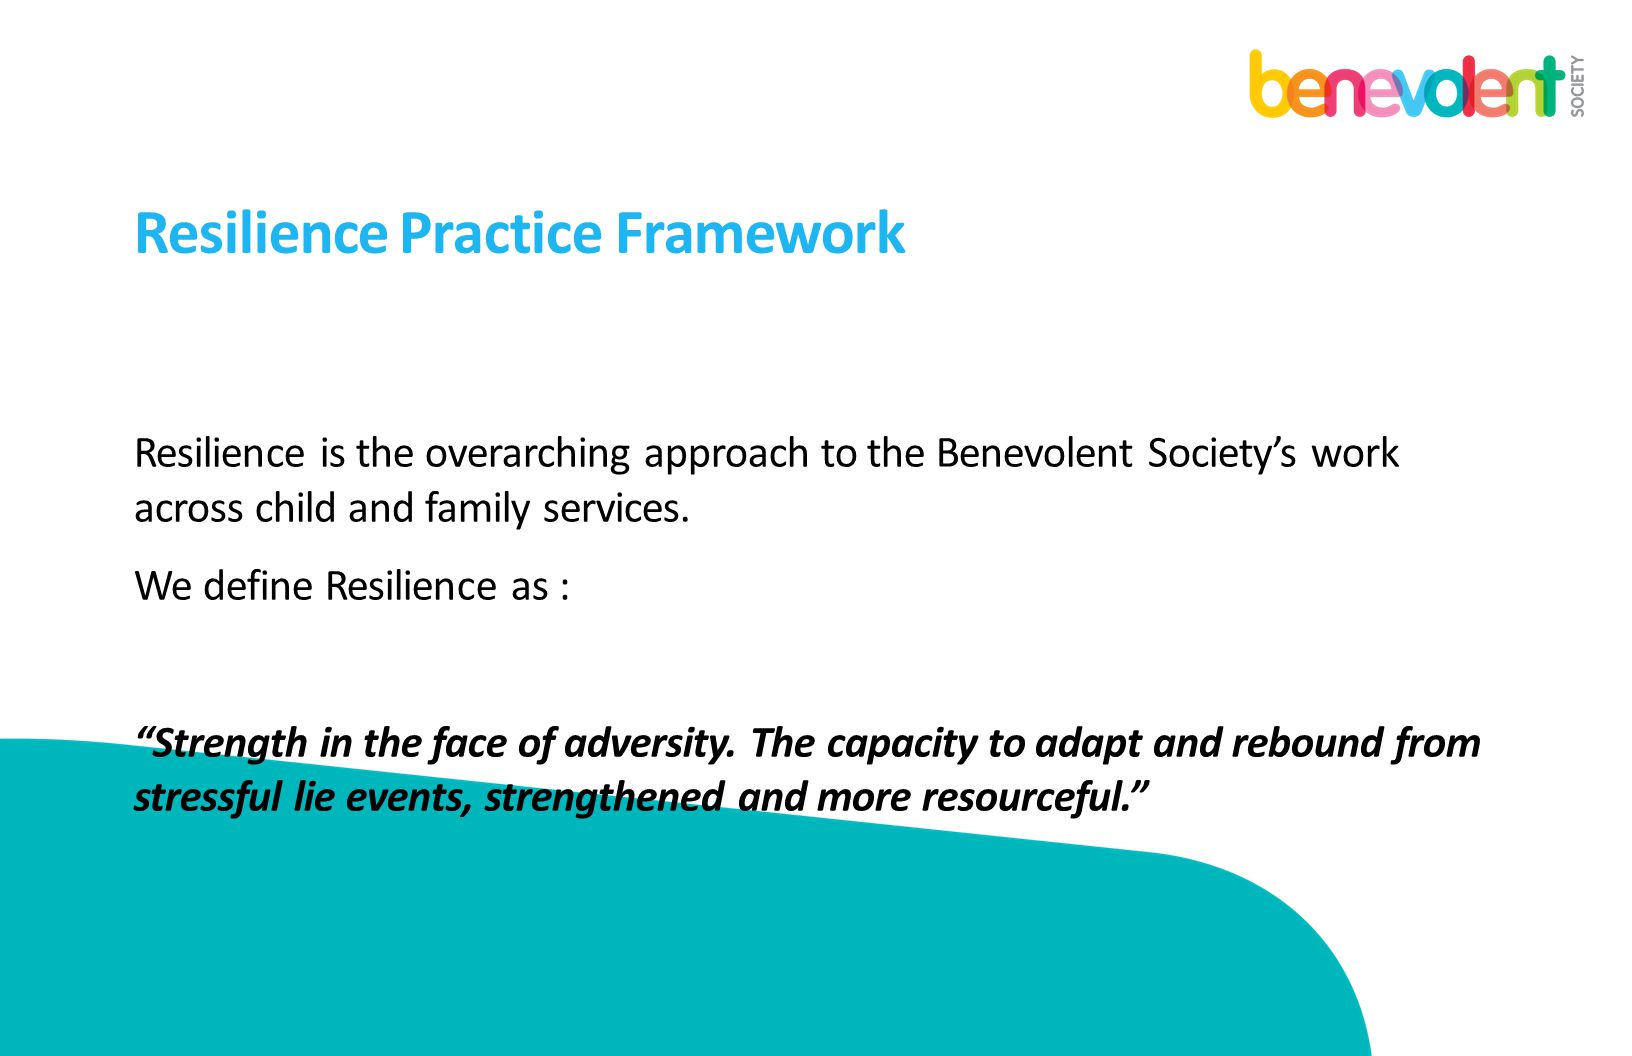 Resilience Practice Framework